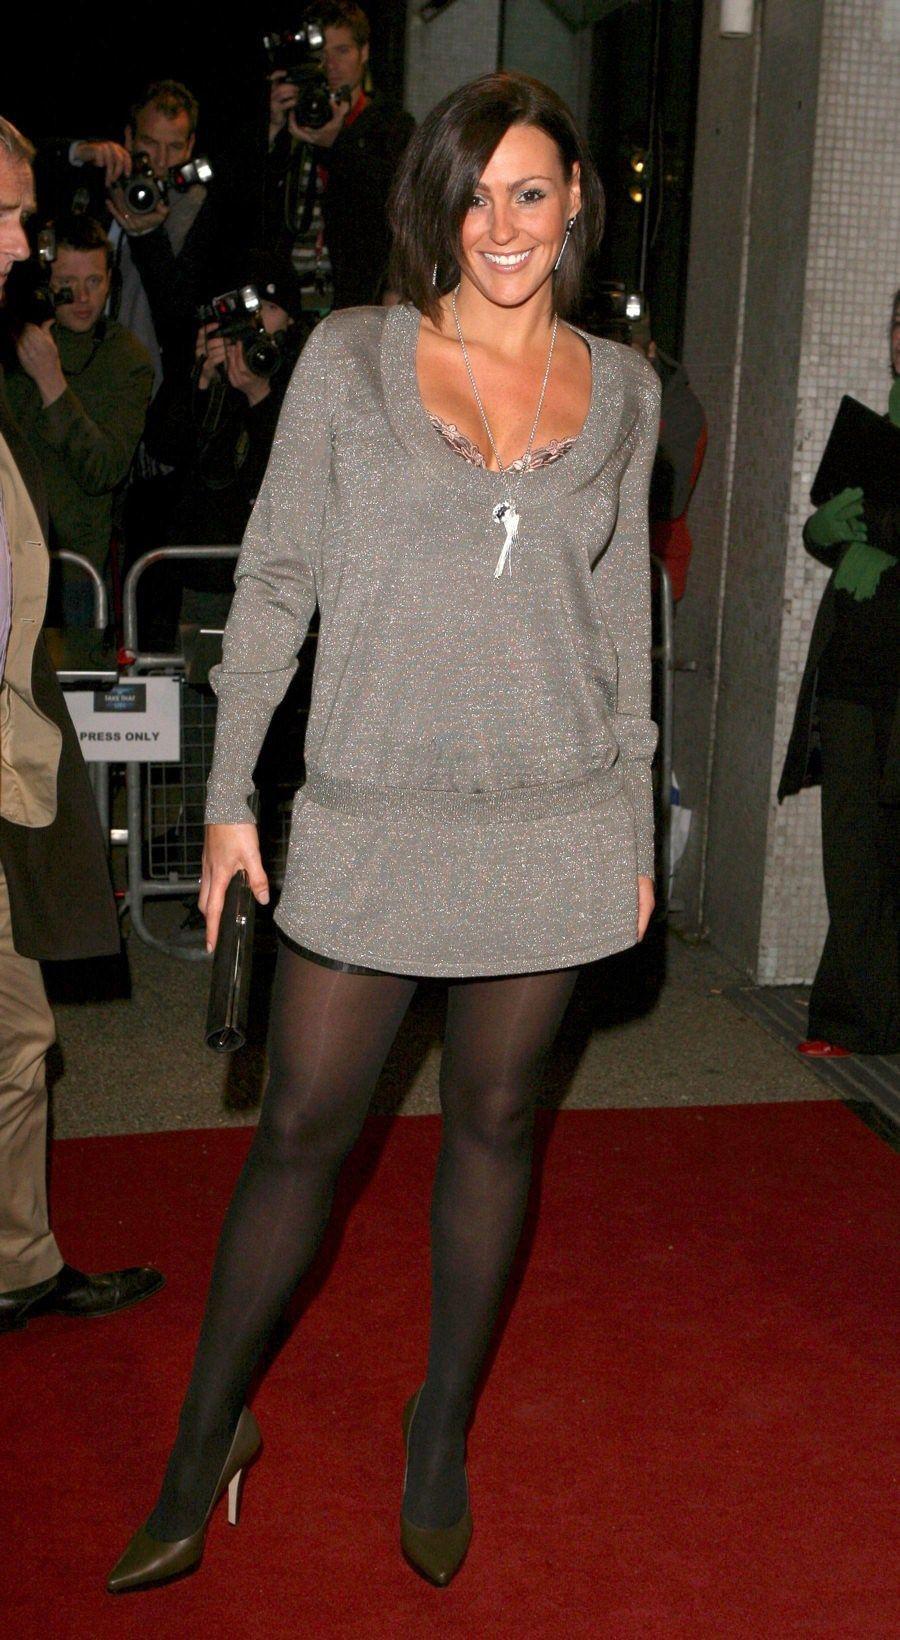 Anal crossdresser extreme high heels